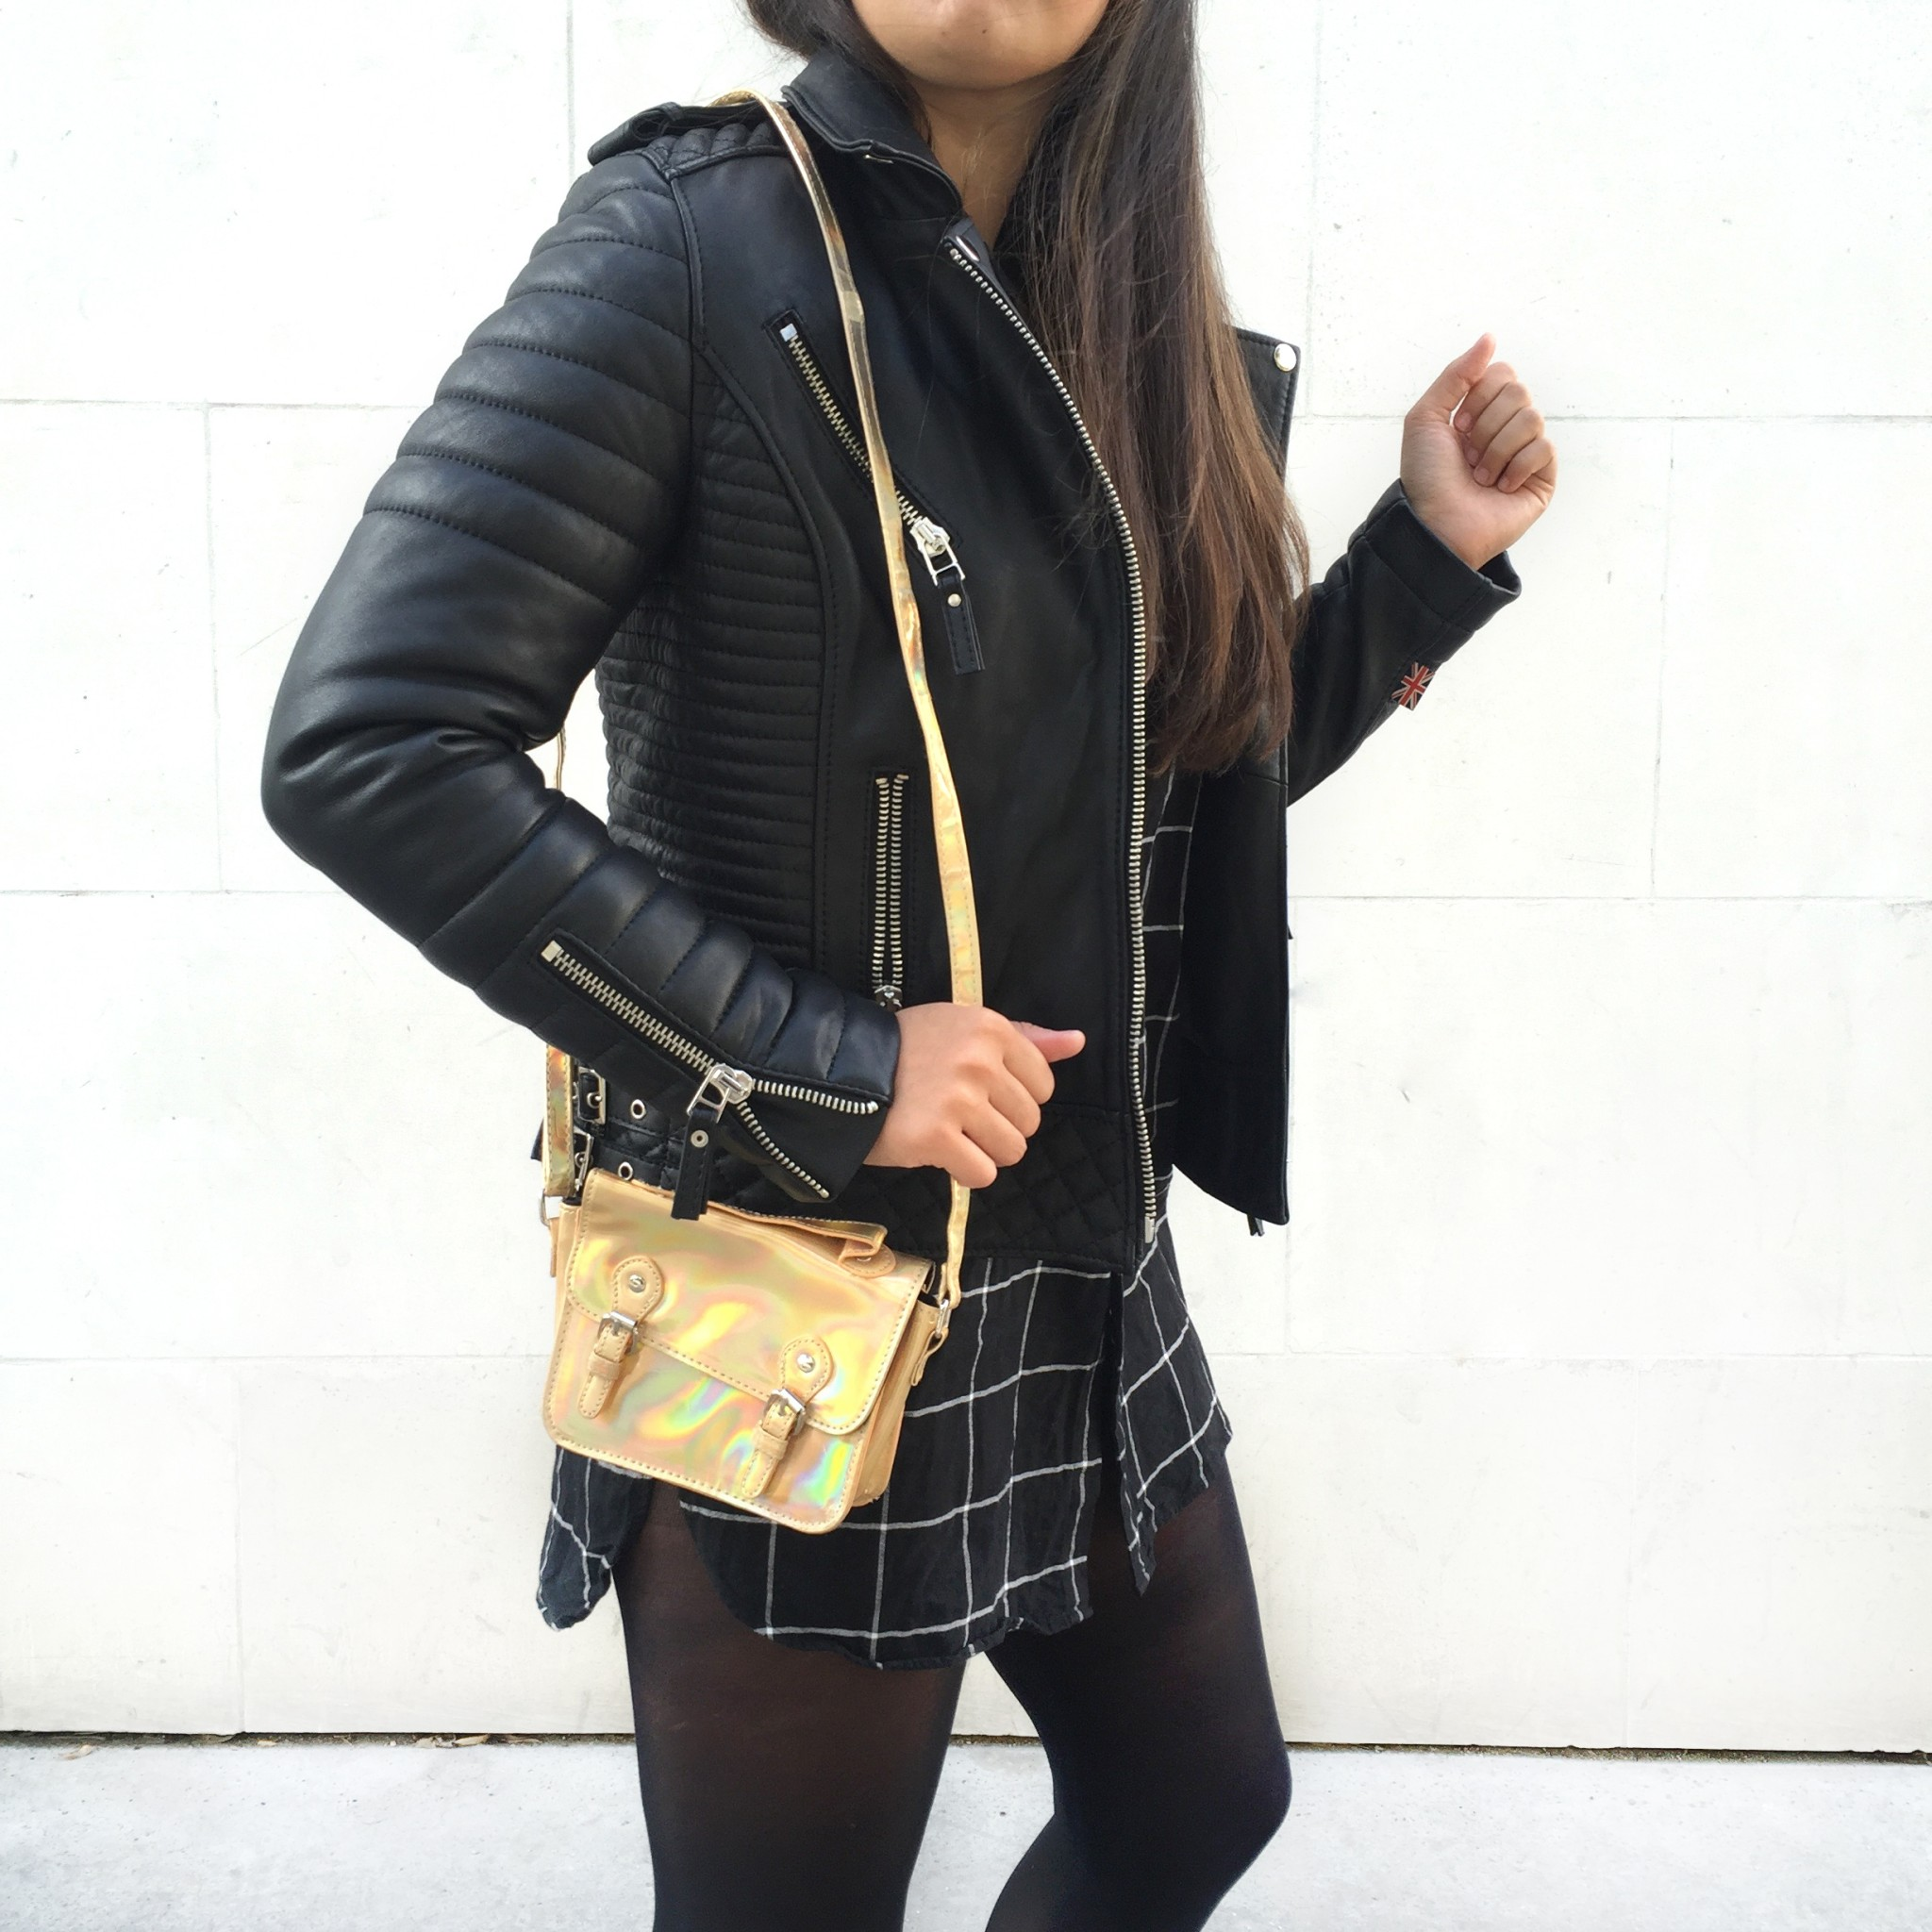 detai look outfit black meganvlt